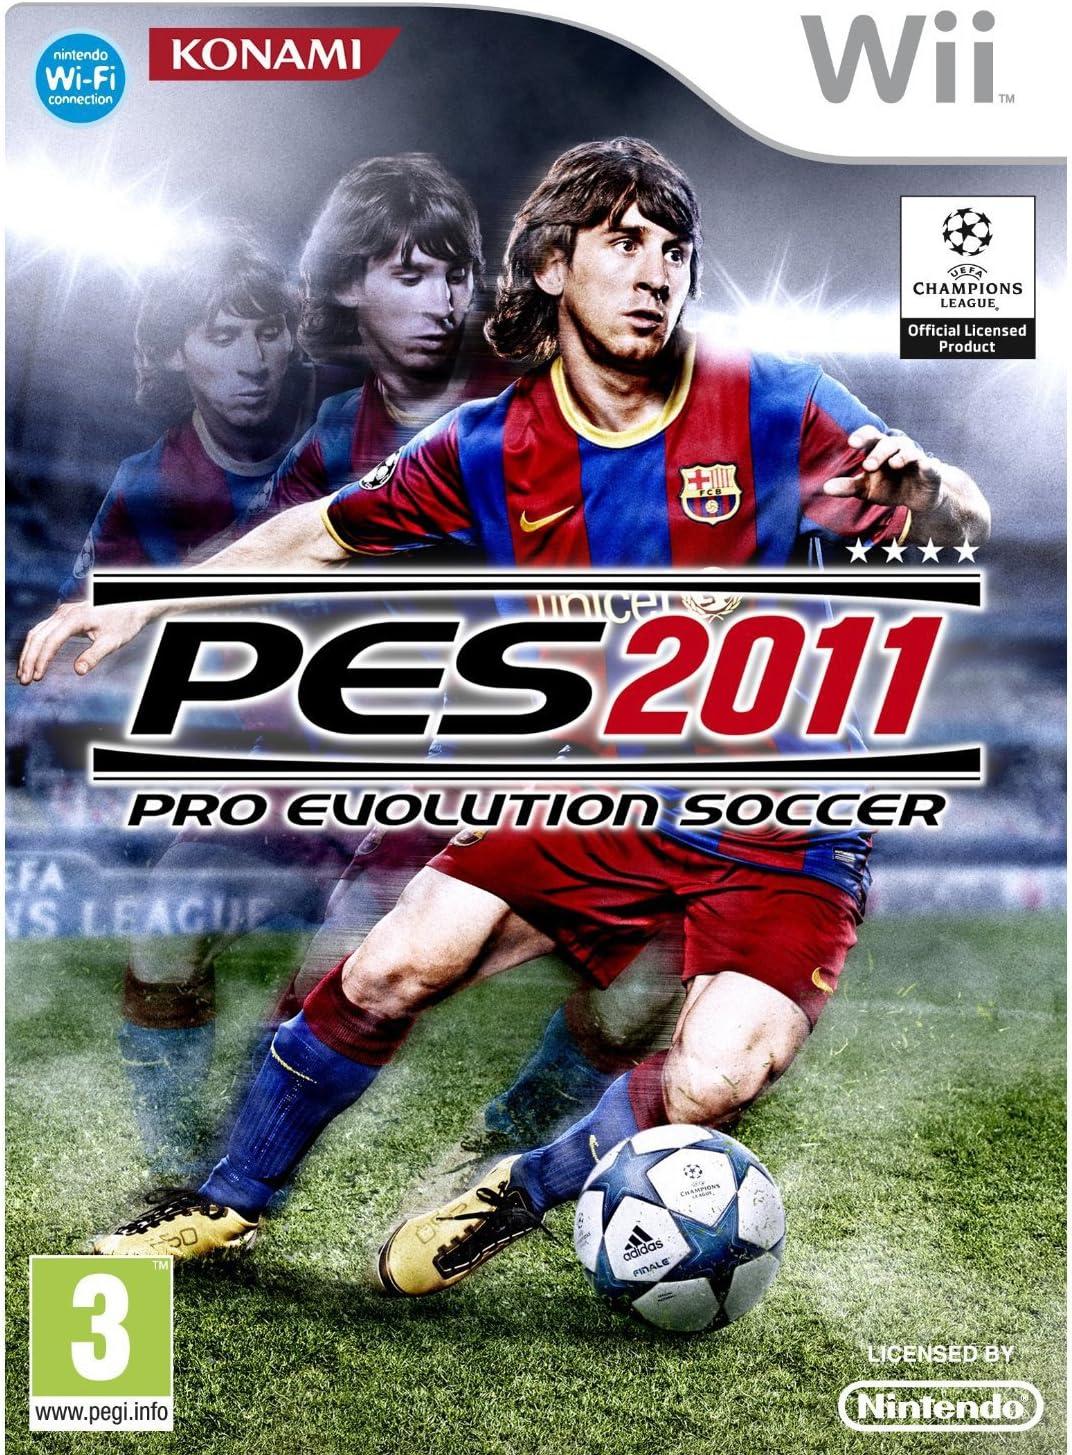 Pes 11 : Pro Evolution Soccer 2011: Amazon.es: Videojuegos